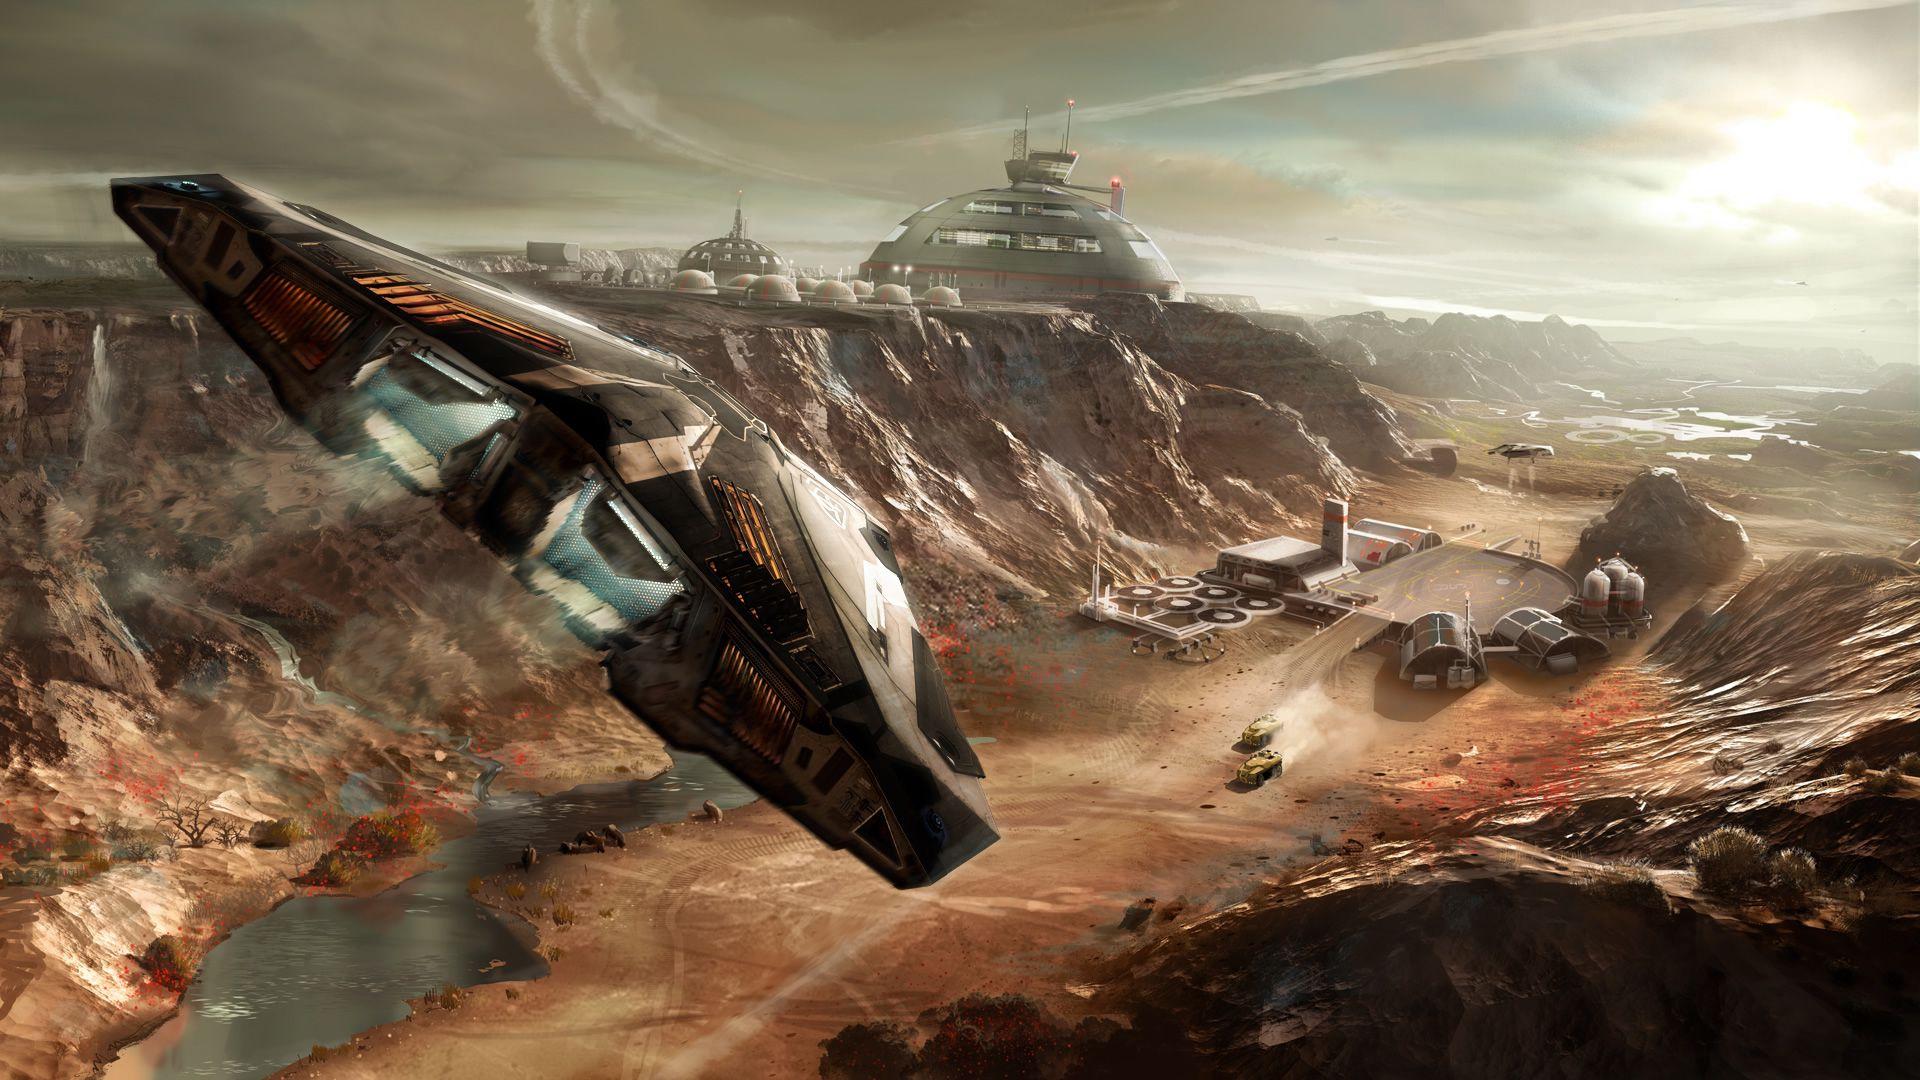 Elite: Dangerous arriverà su PS4 nel 2017